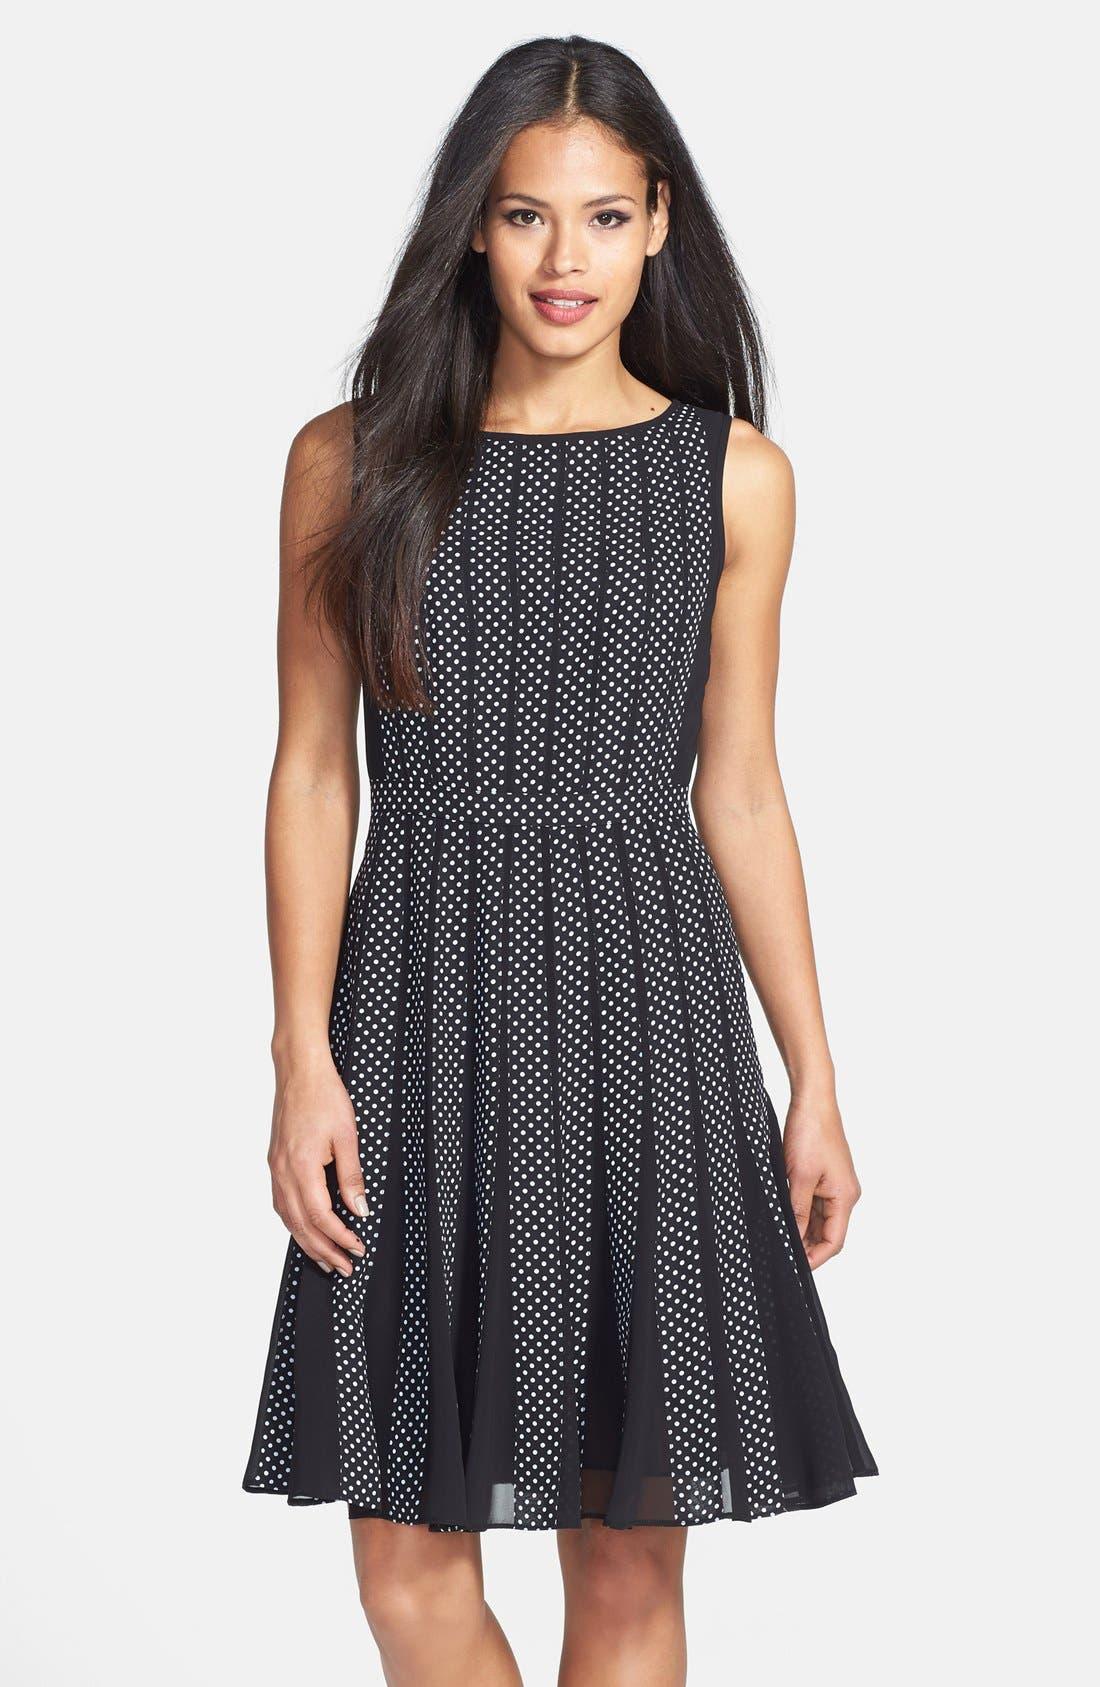 Alternate Image 1 Selected - Adrianna Papell Polka Dot Chiffon Fit & Flare Dress